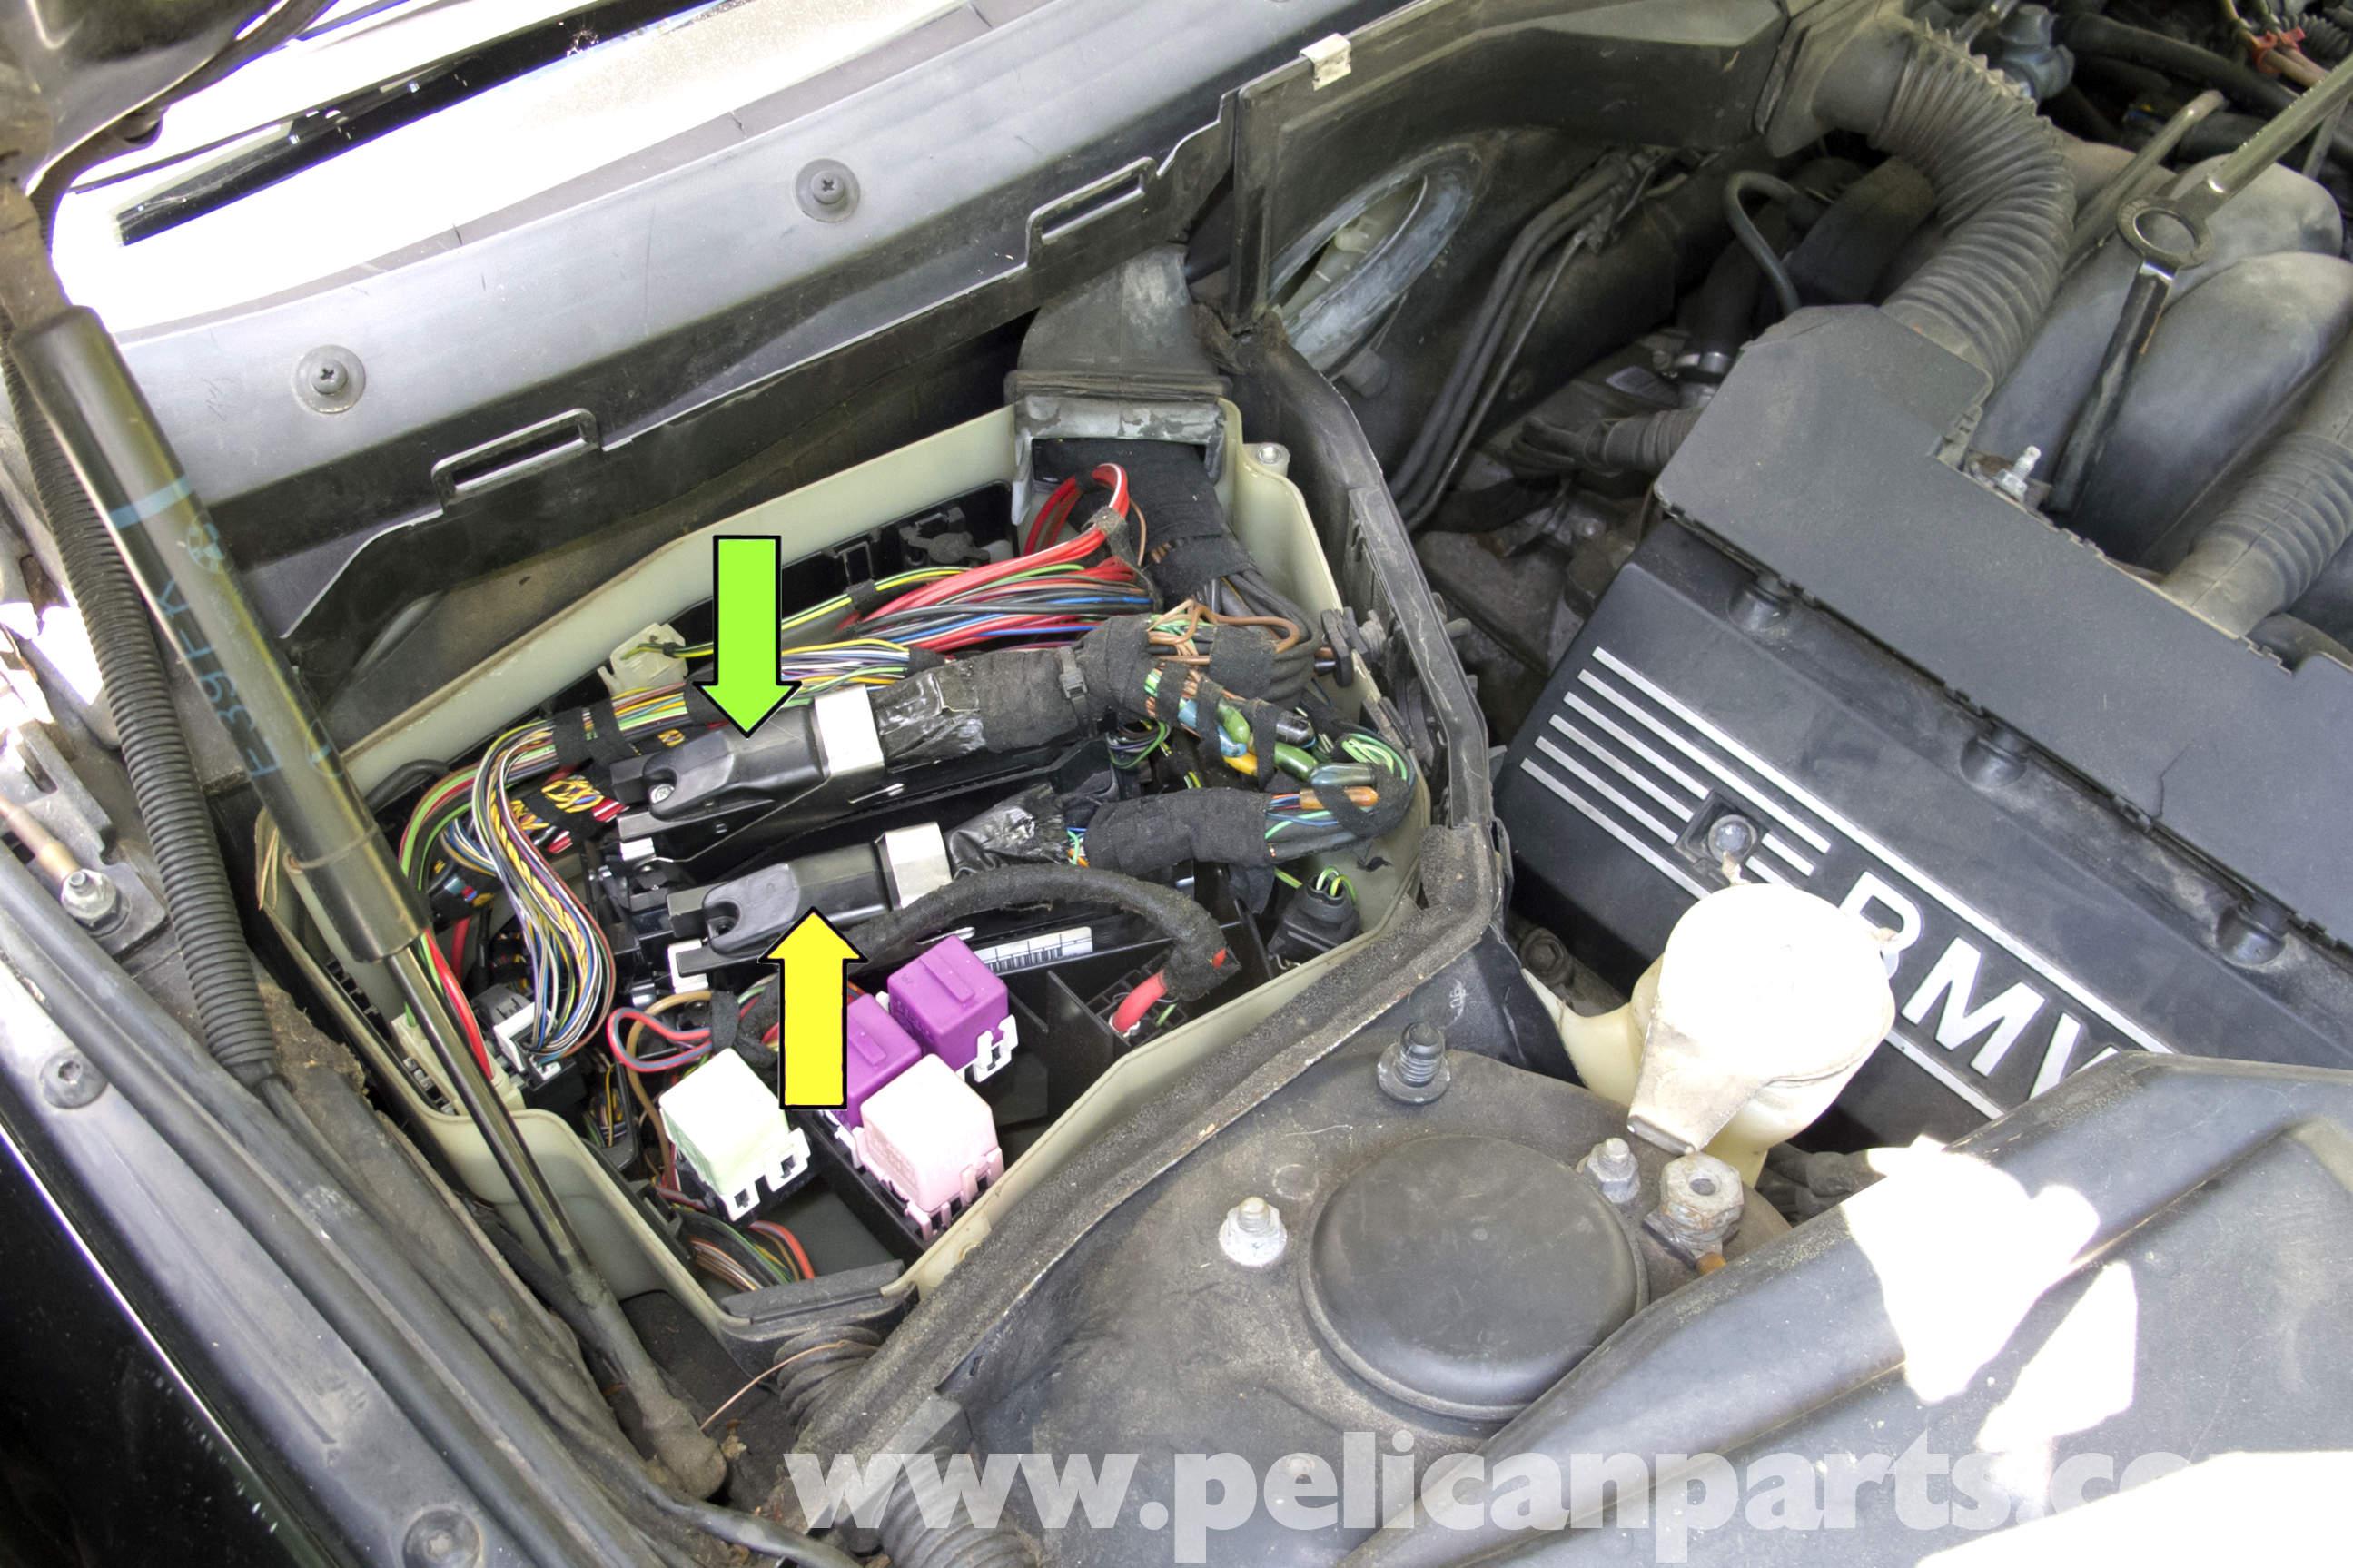 I Fuse Diagram Bmw E39 5 Series Engine Management Systems 1997 2003